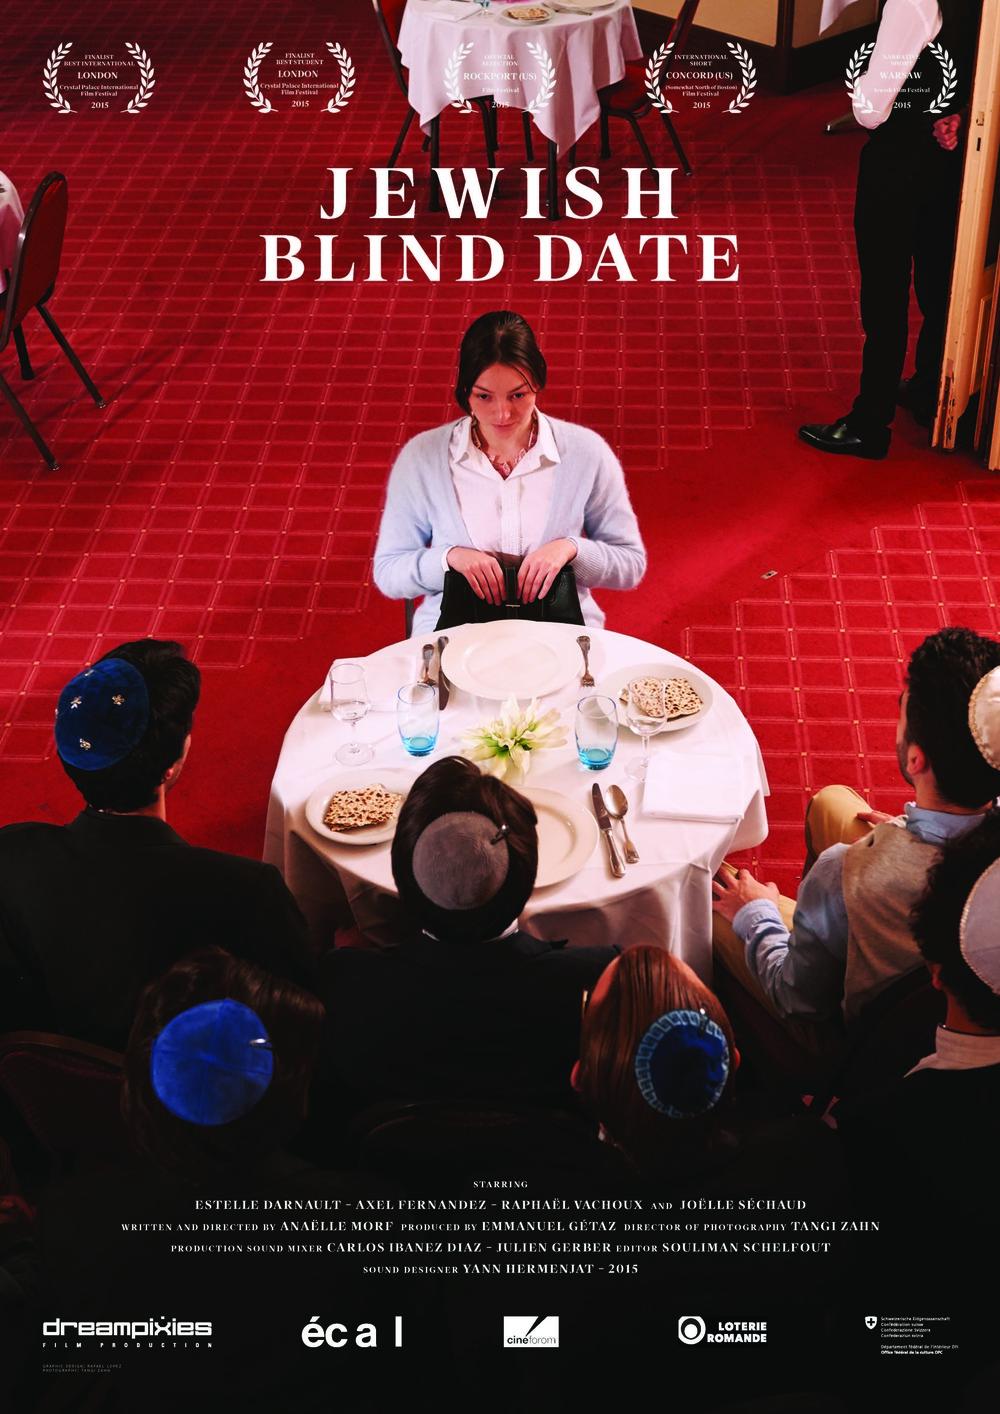 poster_JEWISH_BLIND_DATE.jpg